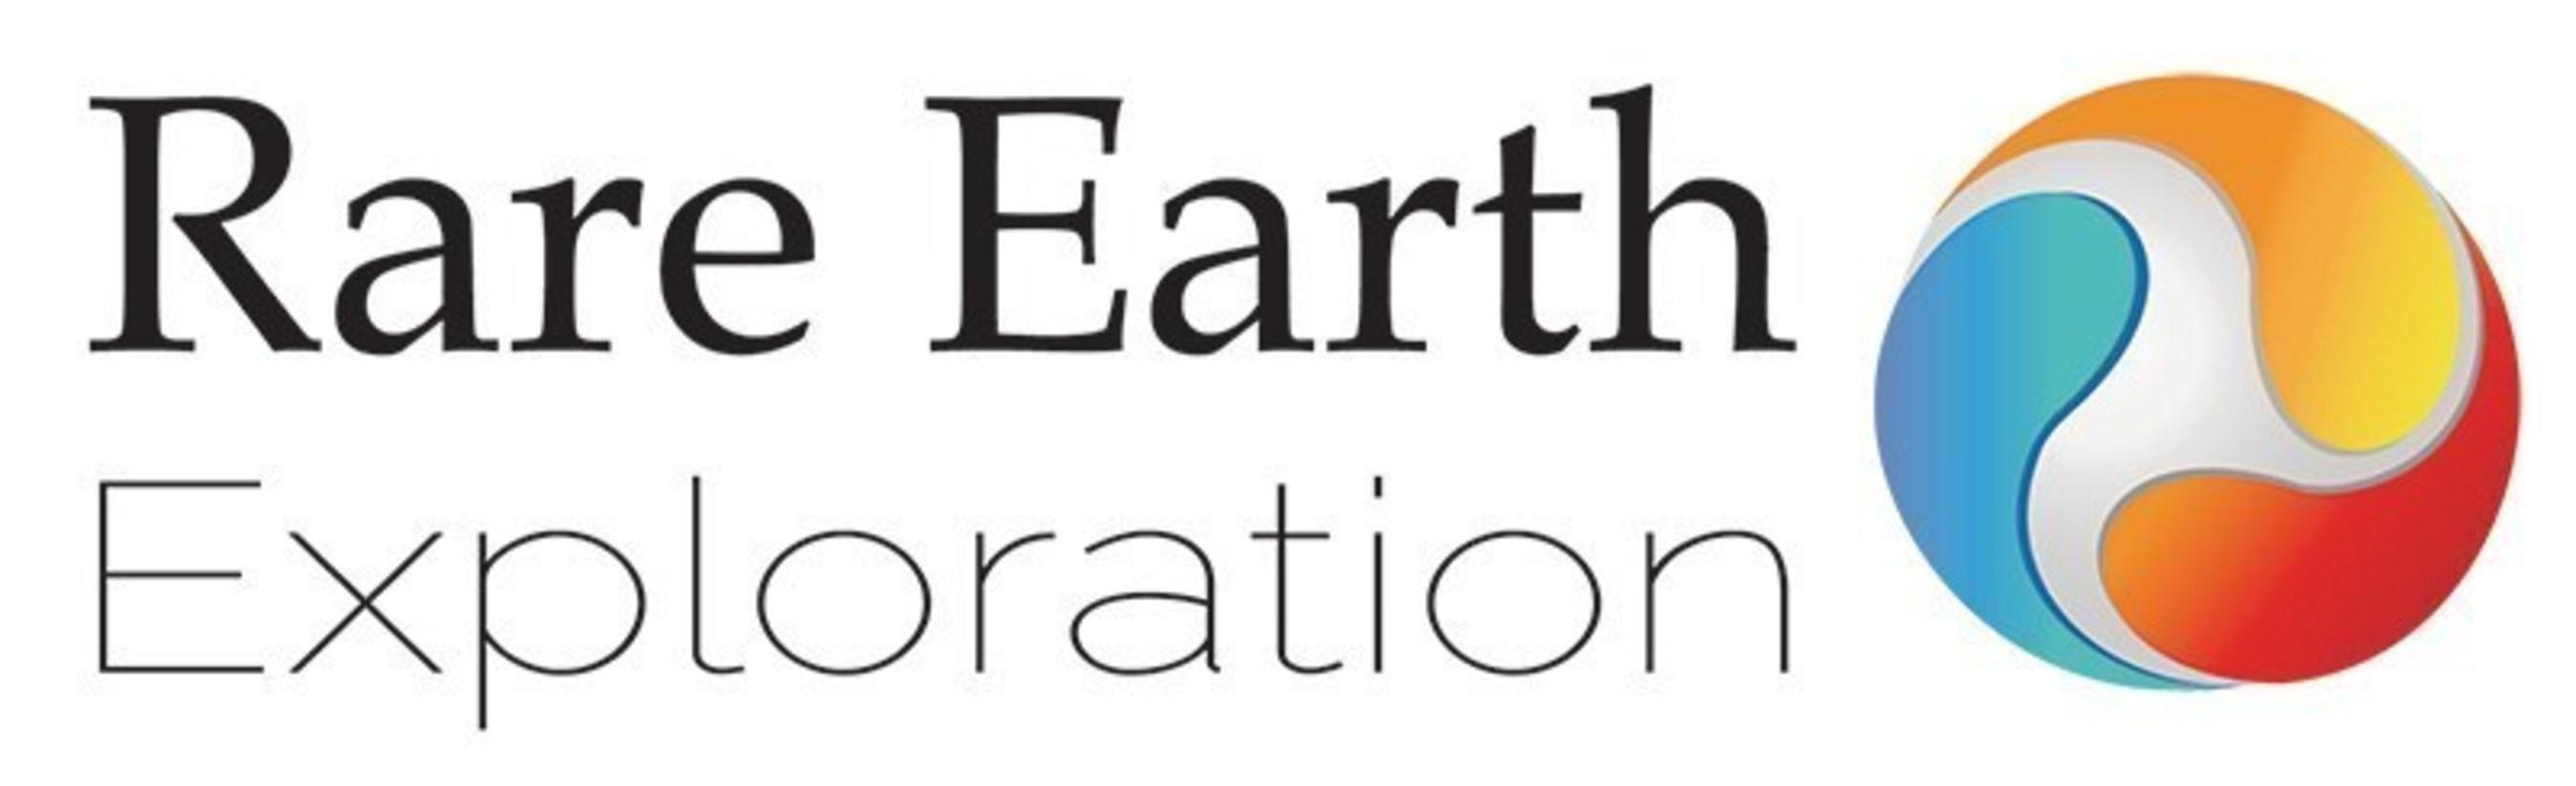 Rare Earth Exploration Logo